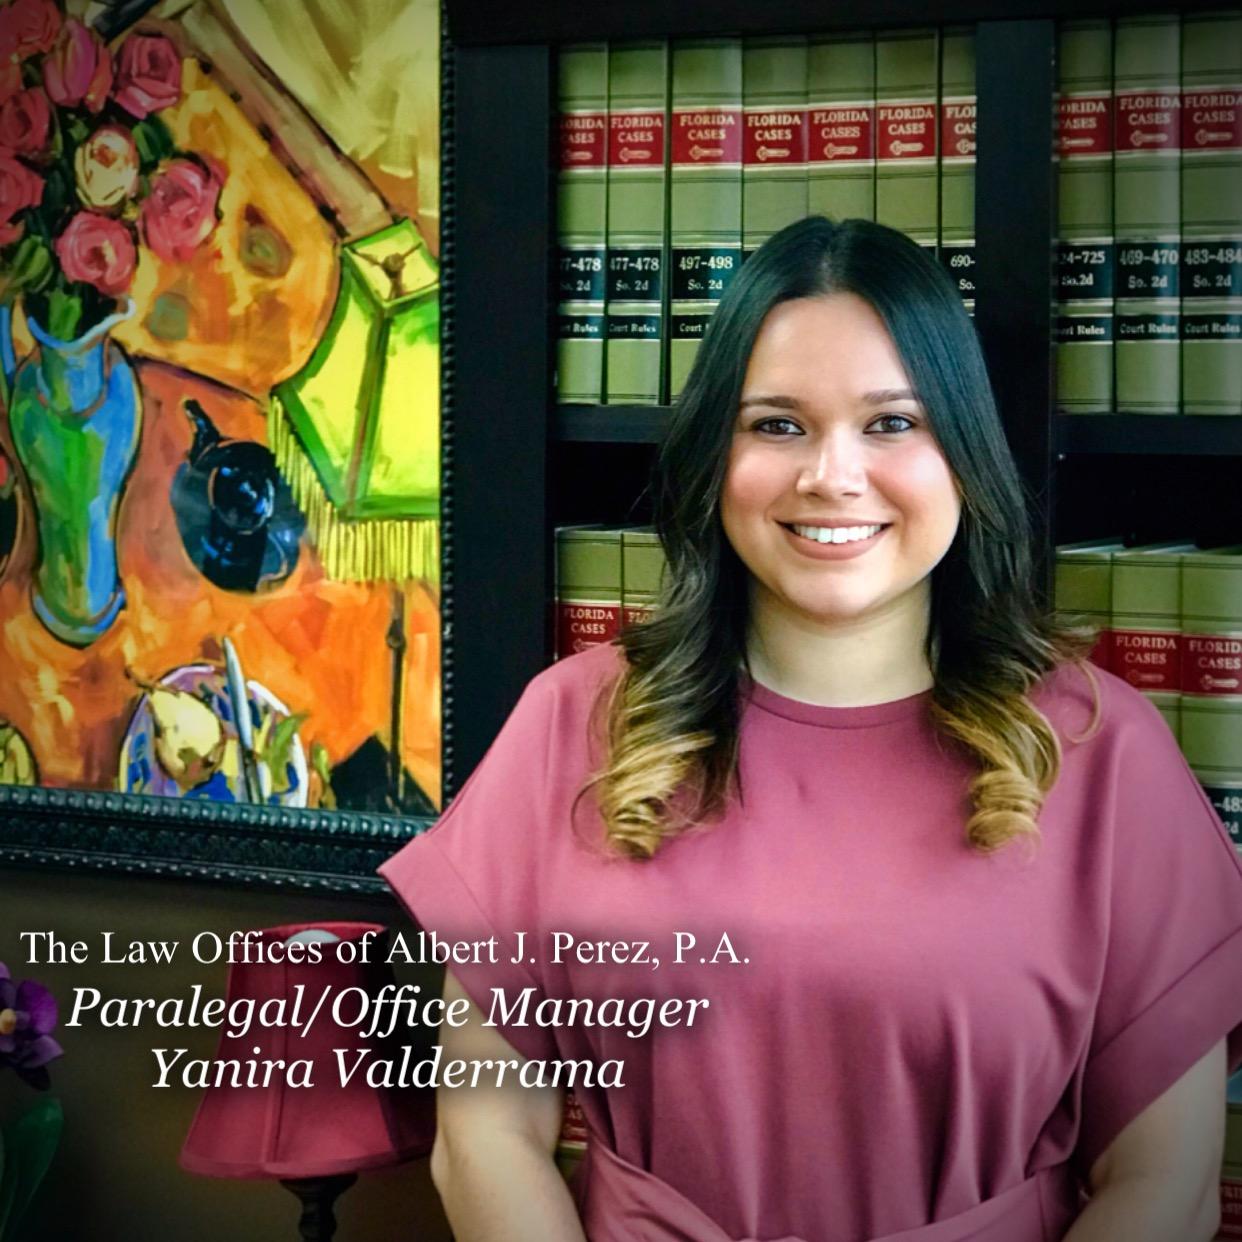 Yanira Valderrama Ajp Law